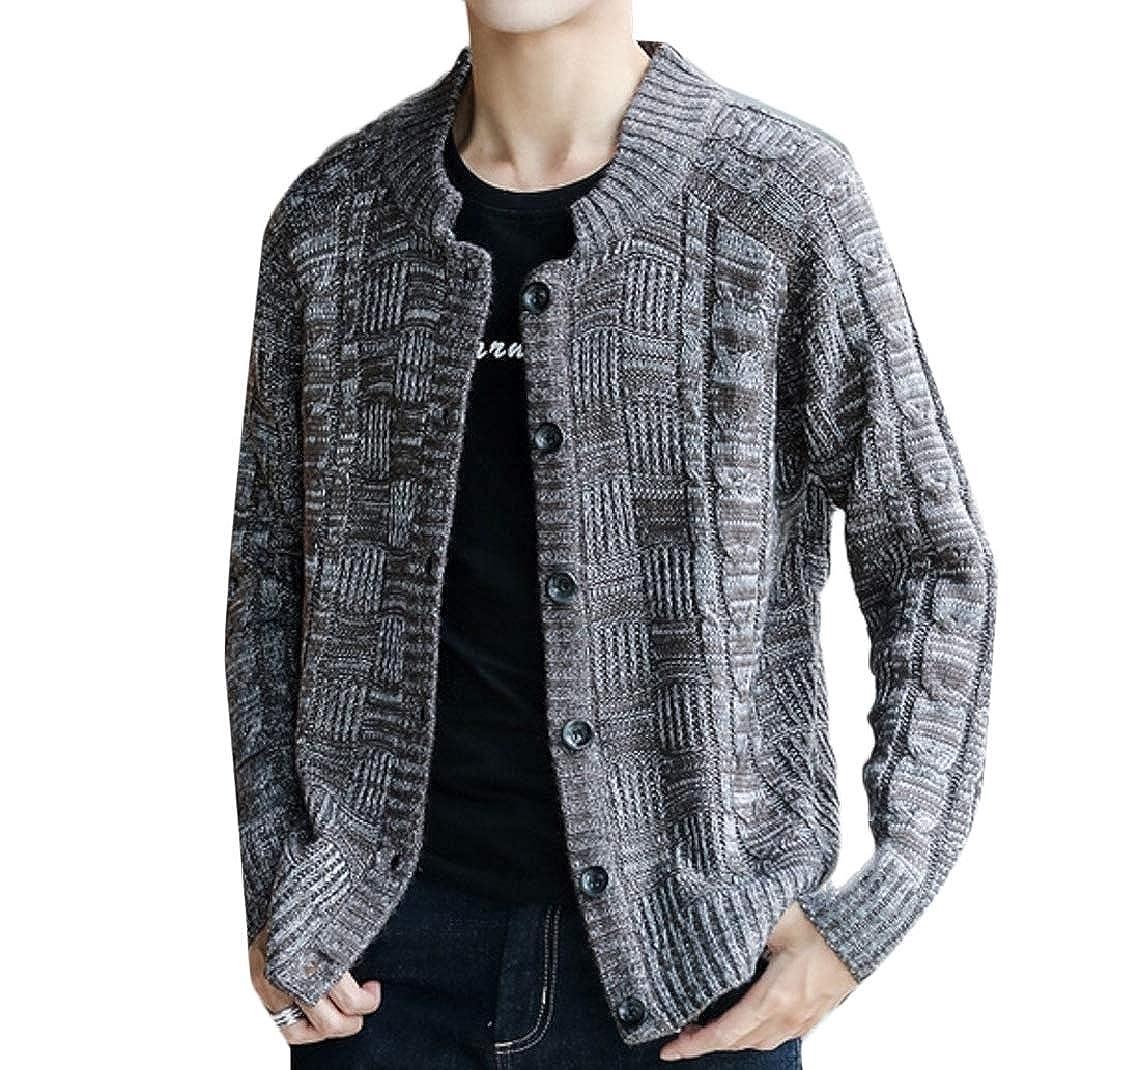 Jmwss QD Mens Casual Solid Knitting Single Breasted Cardigan Sweaters